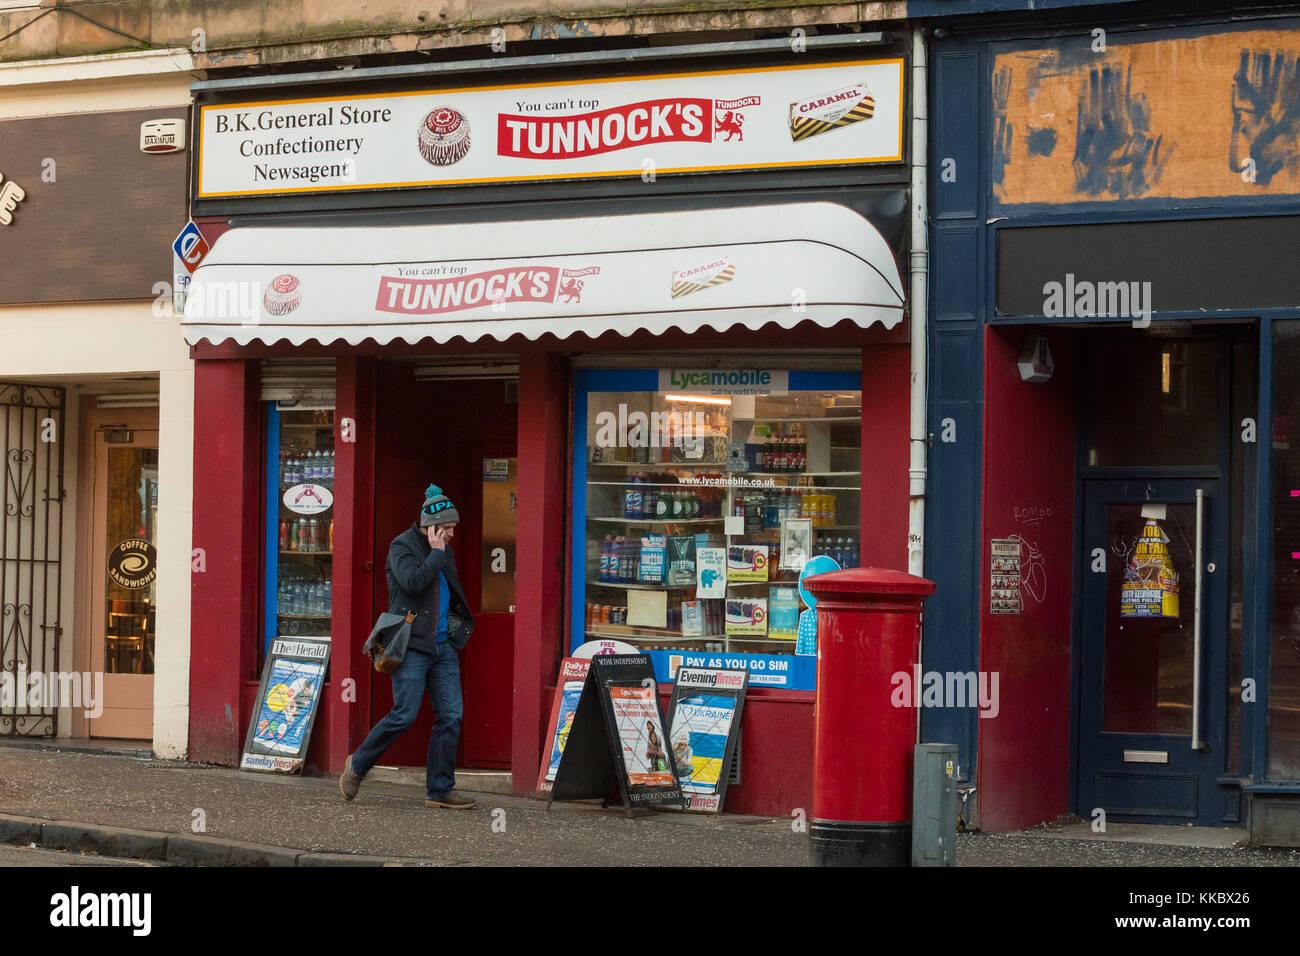 Corner Shop General Store Newsagents on Great Western Road, Glasgow, Scotland, UK - Stock Image